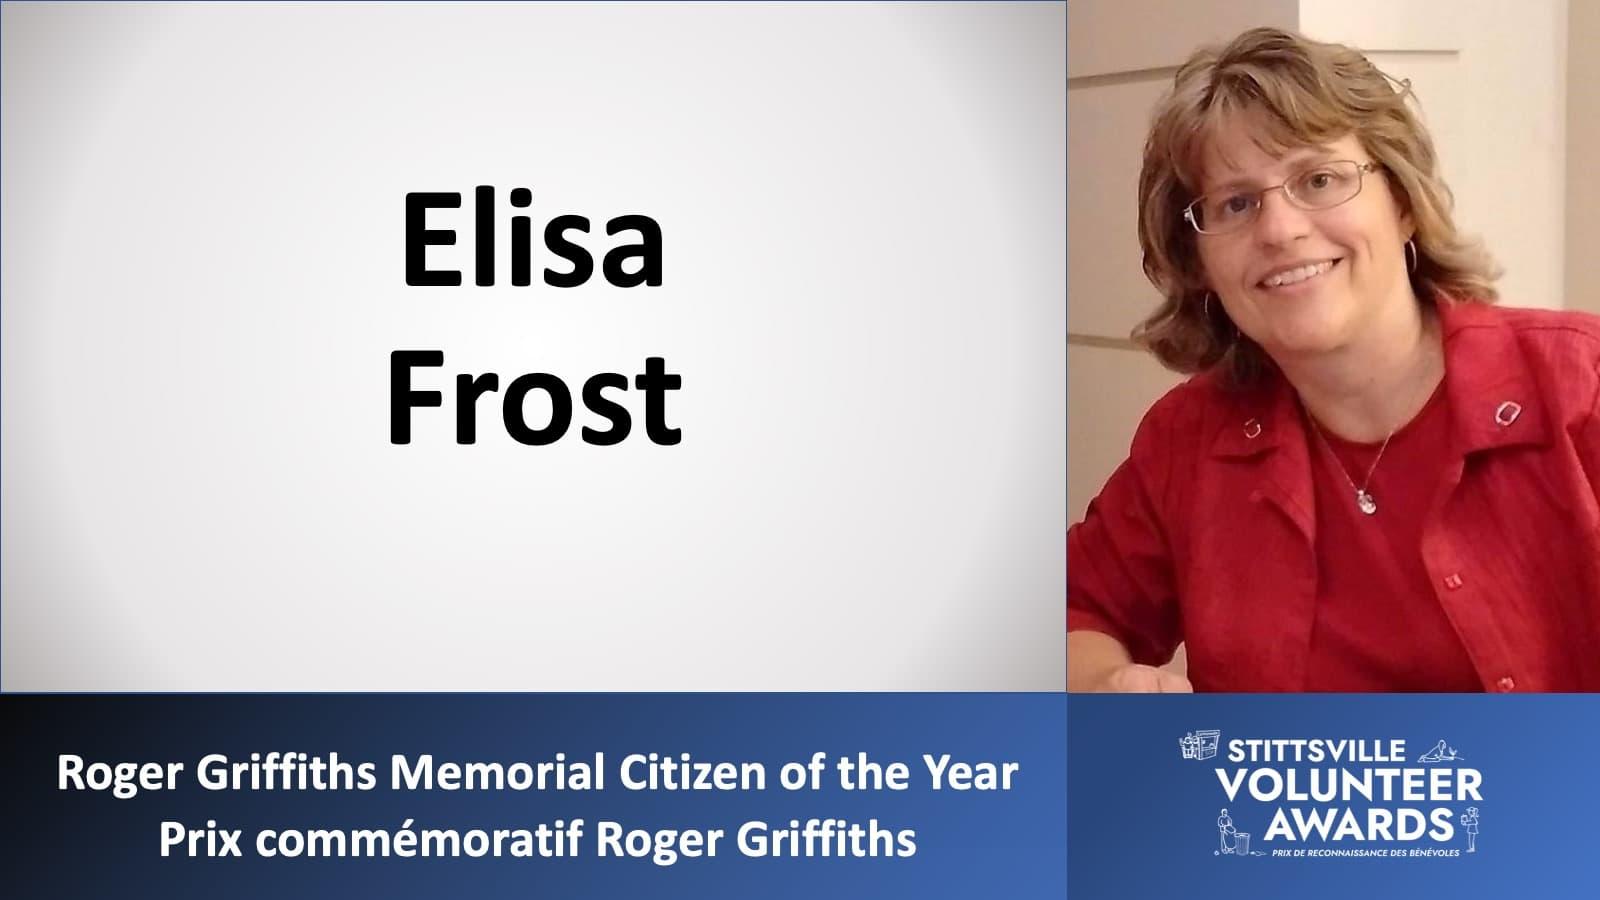 Elisa Frost